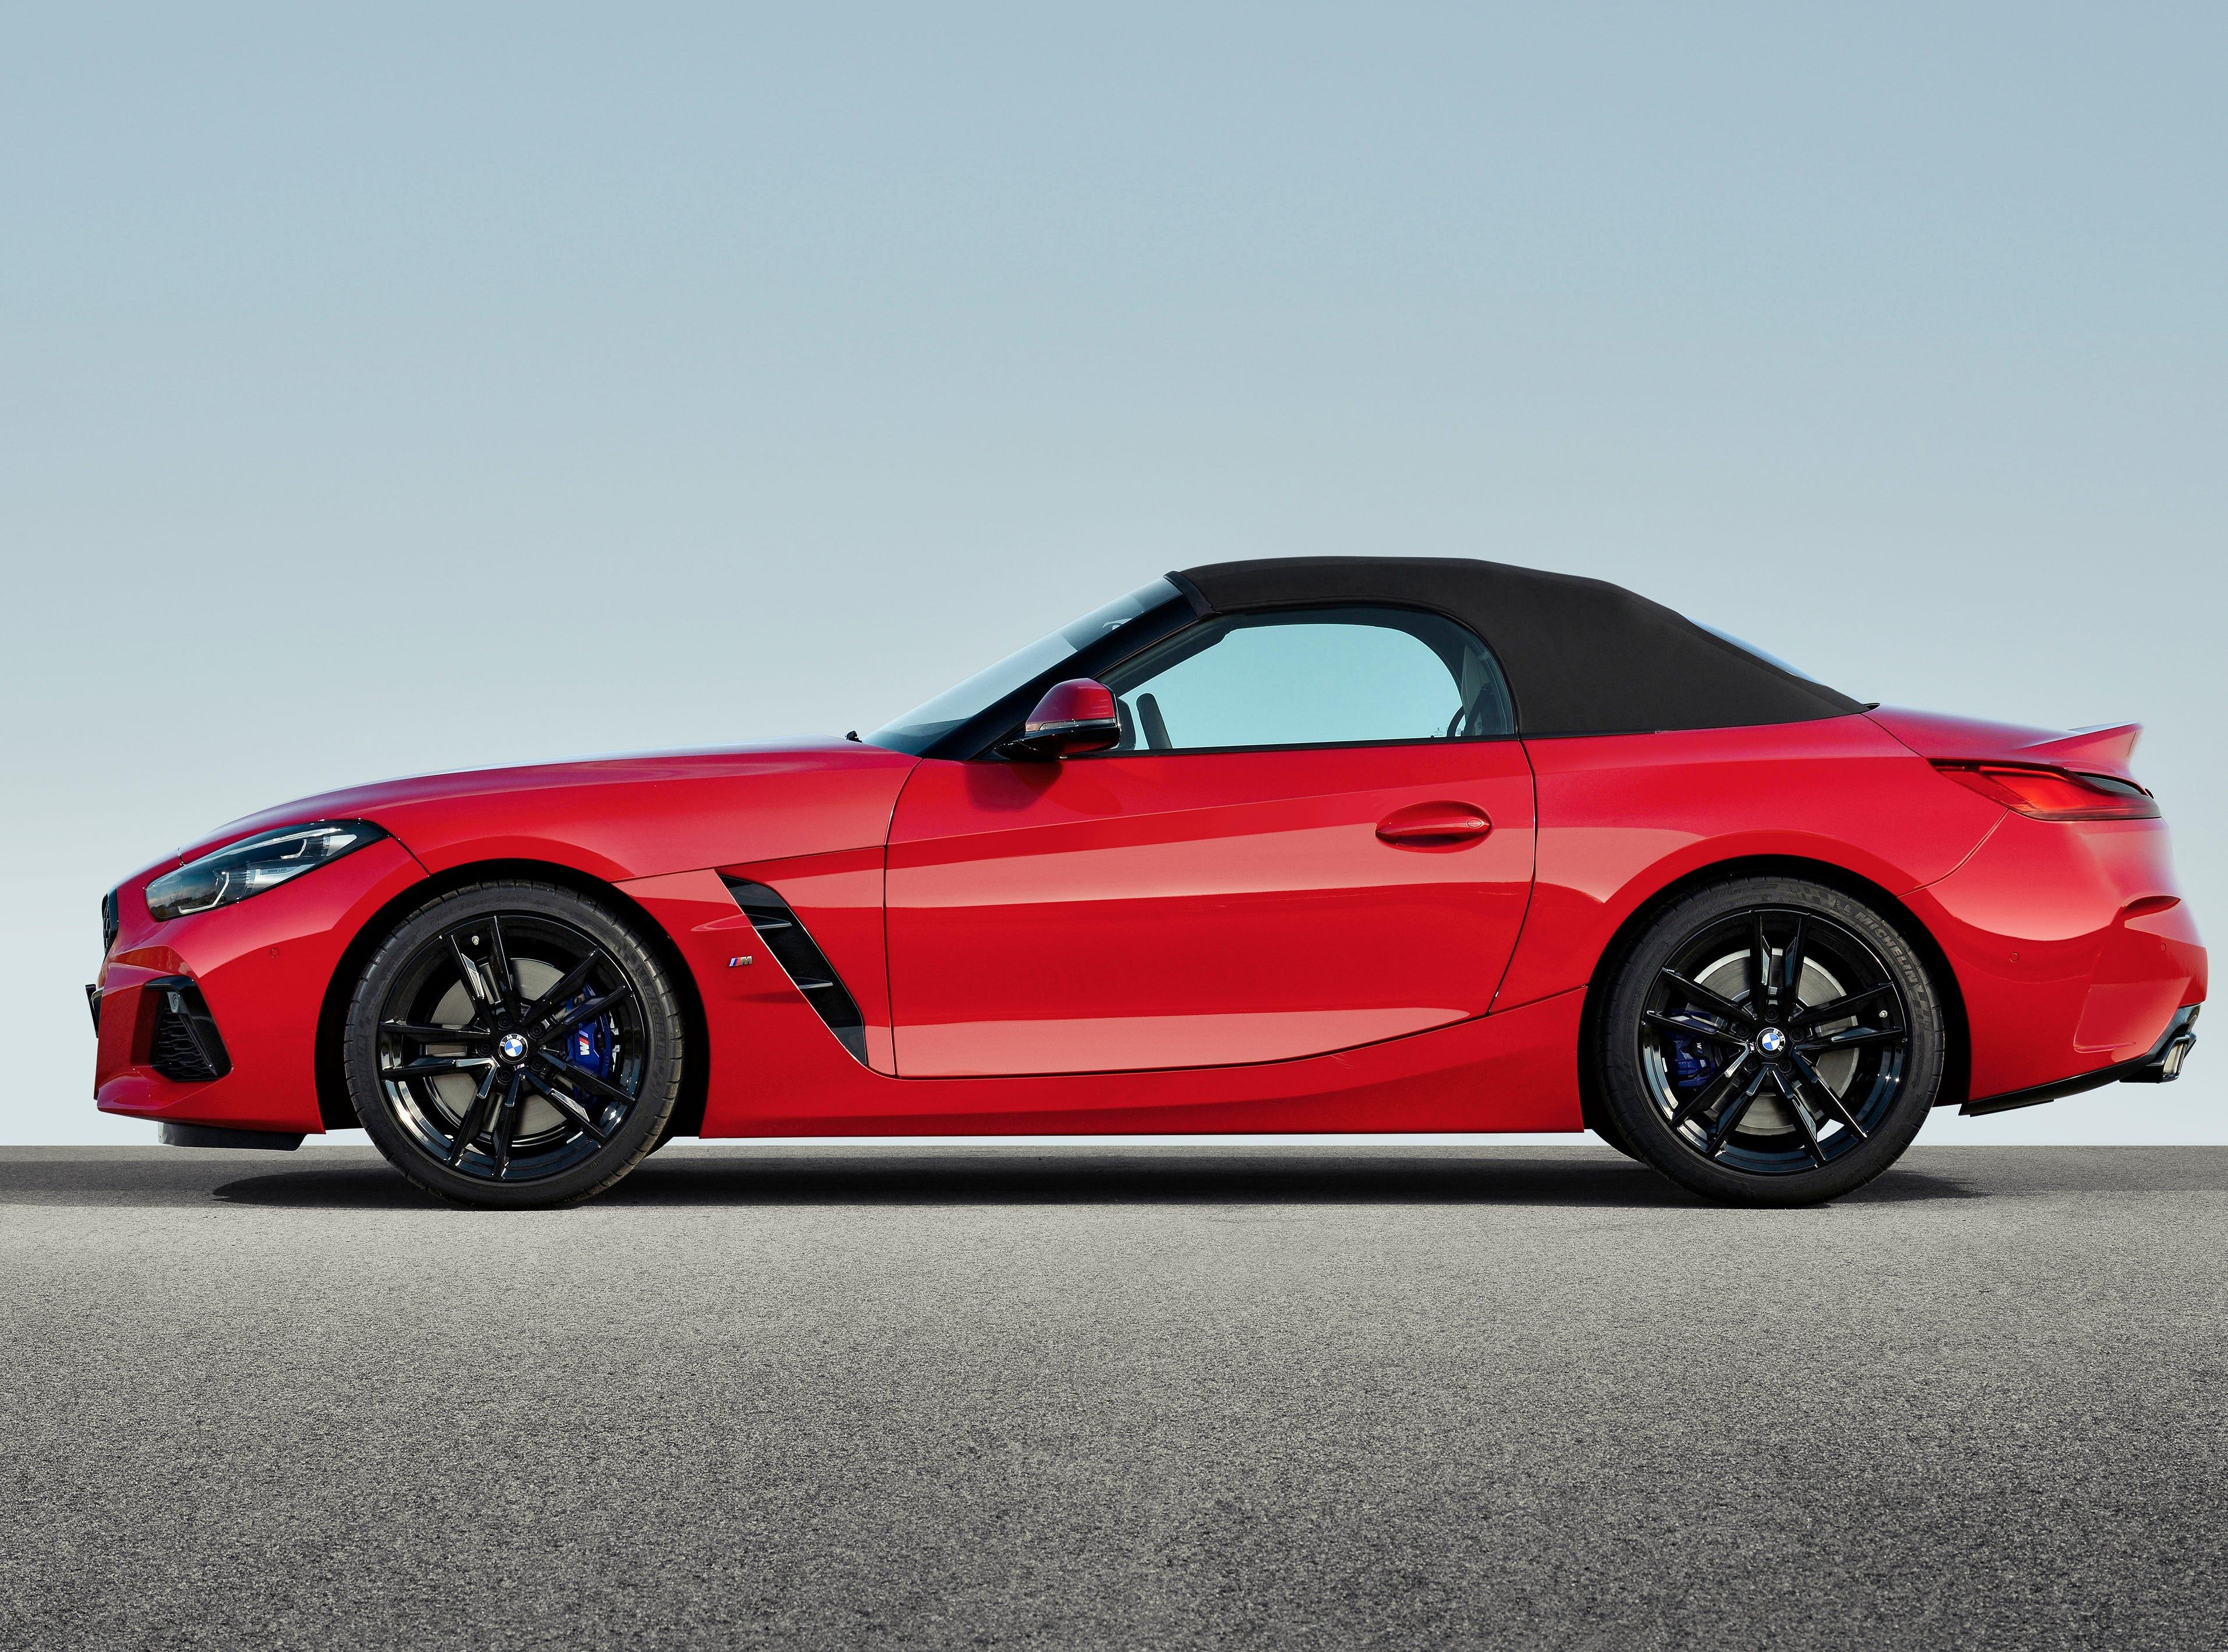 The BMW Z4 Roadster.